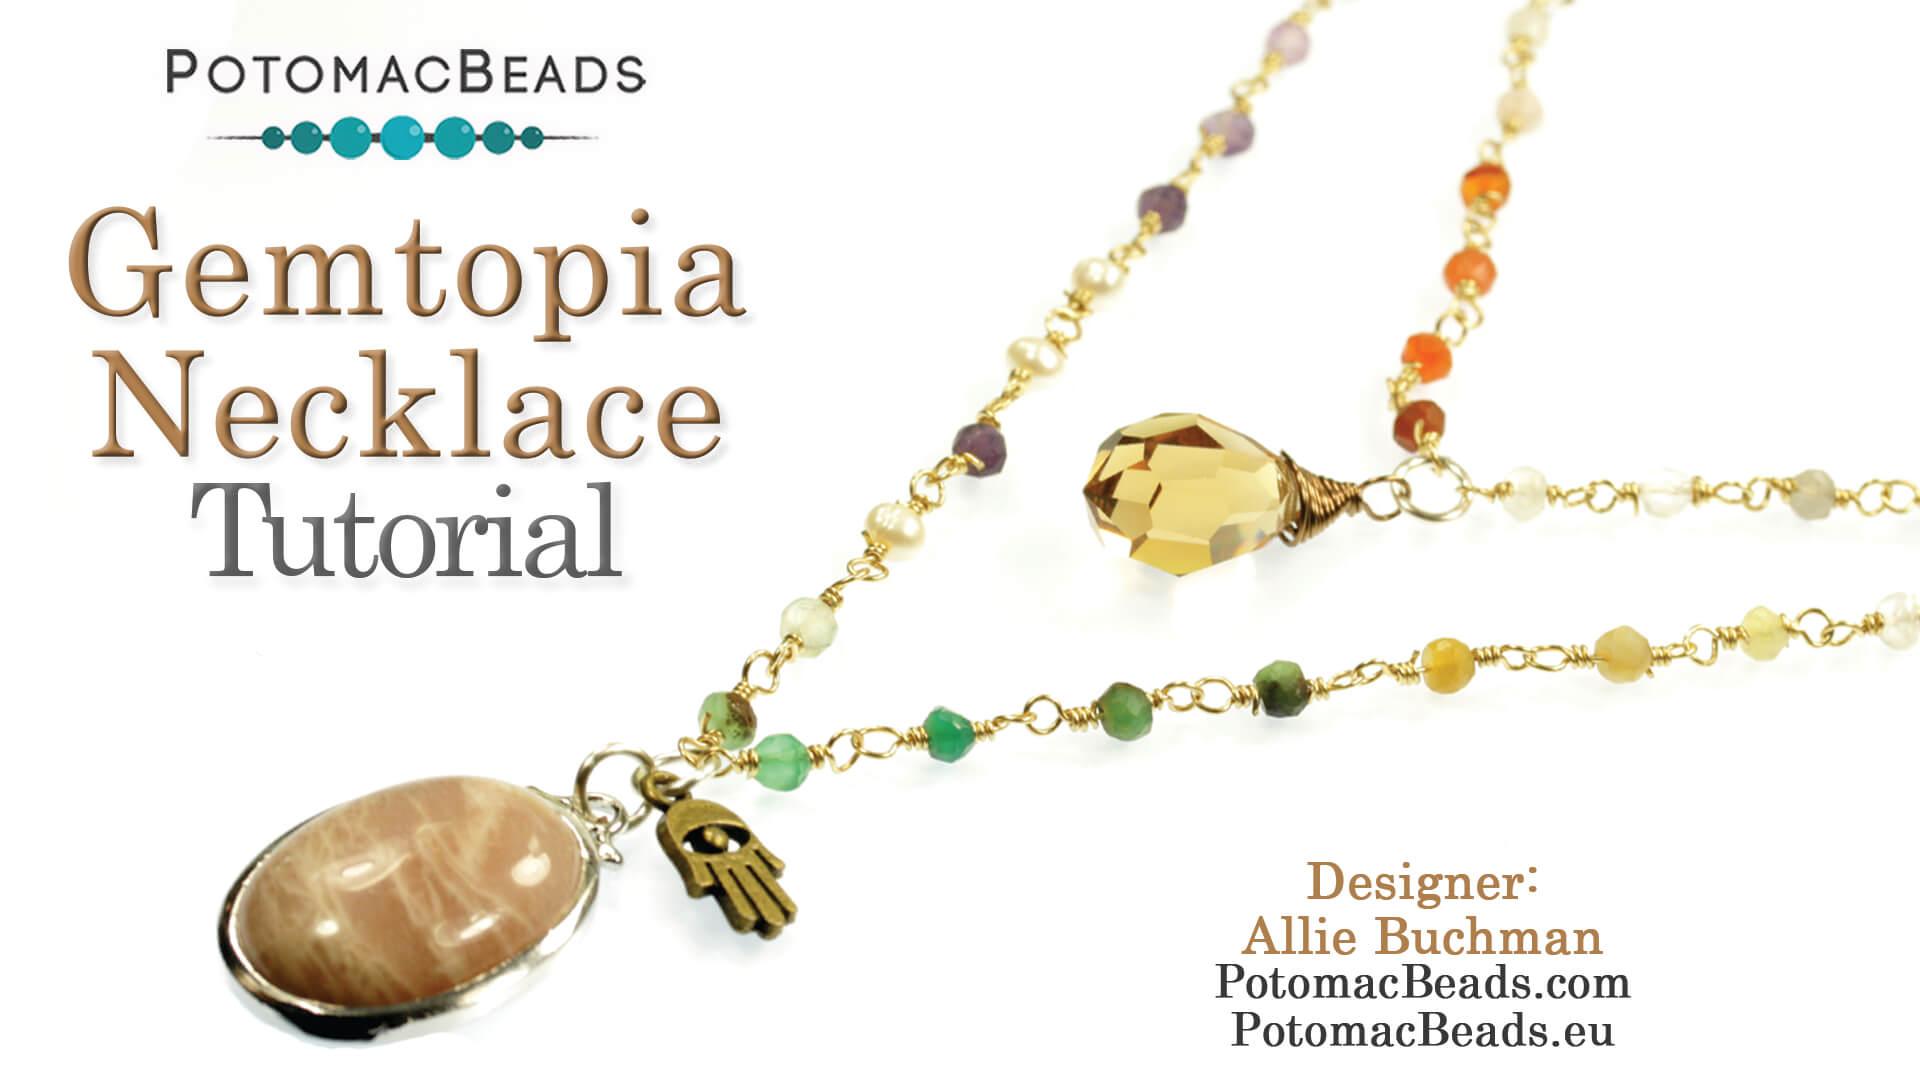 How to Bead Jewelry / Beading Tutorials & Jewel Making Videos / Bead Weaving Tutorials & Necklace Tutorial / Gemtopia Necklace Tutorial